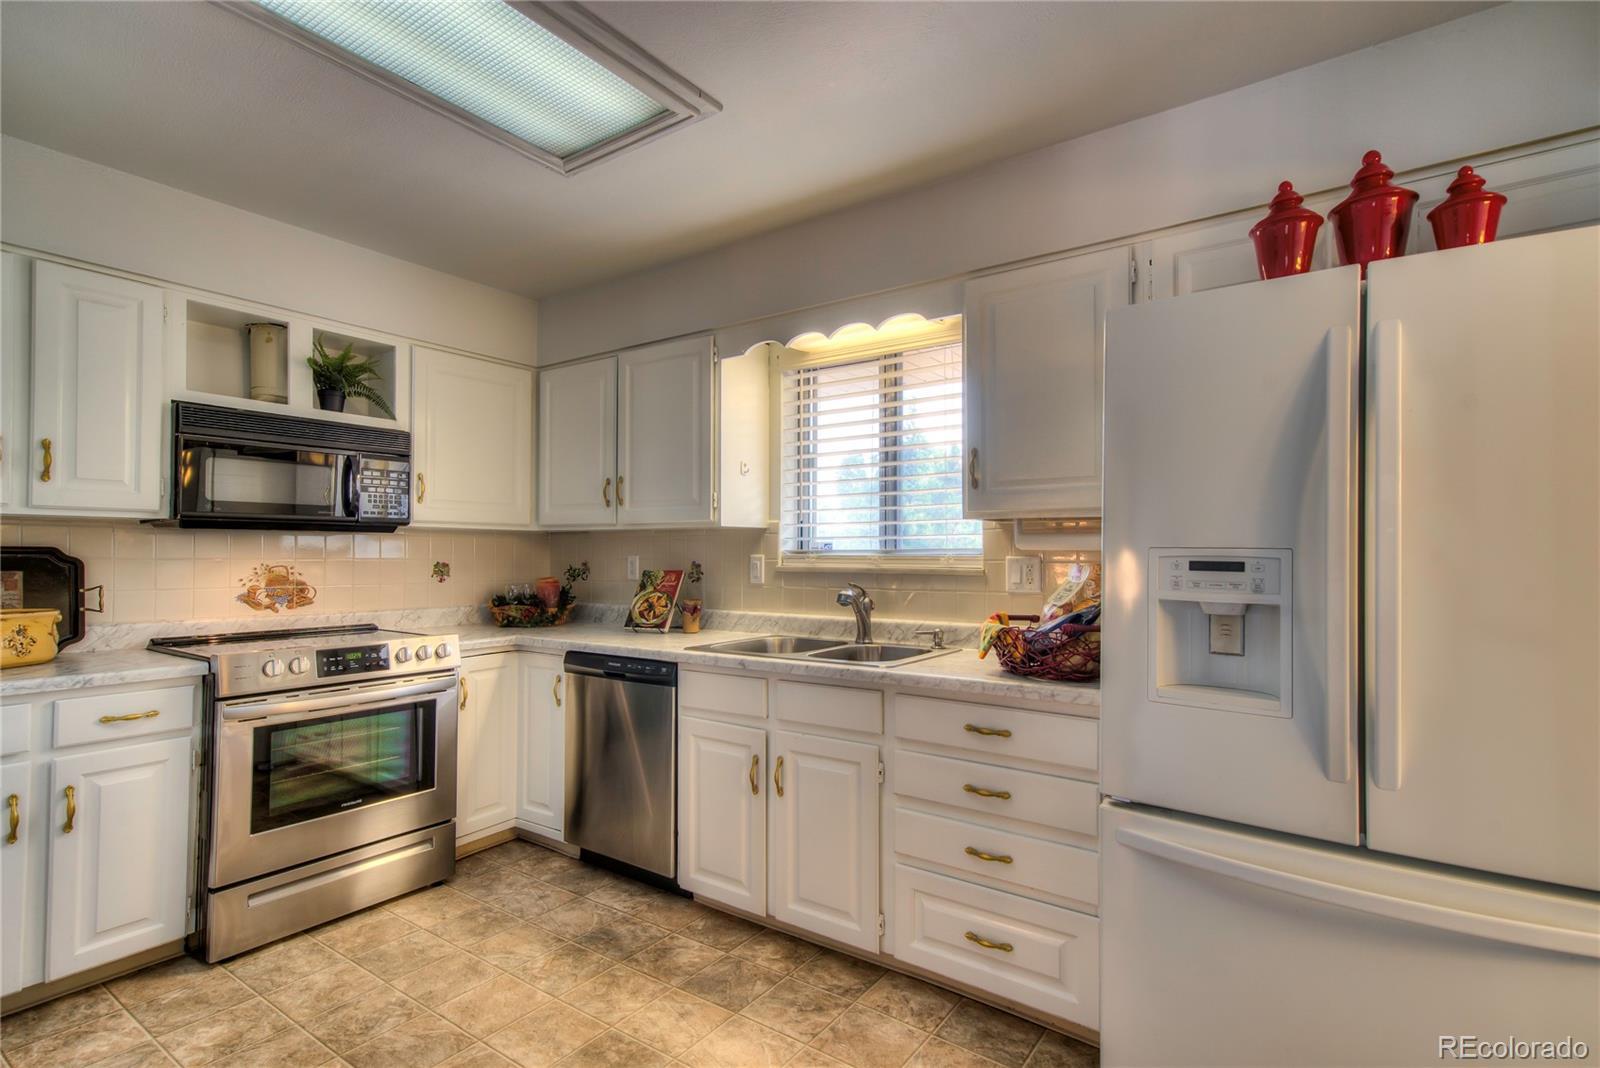 MLS# 2141630 - 20 - 6685 Brook Park Drive, Colorado Springs, CO 80918